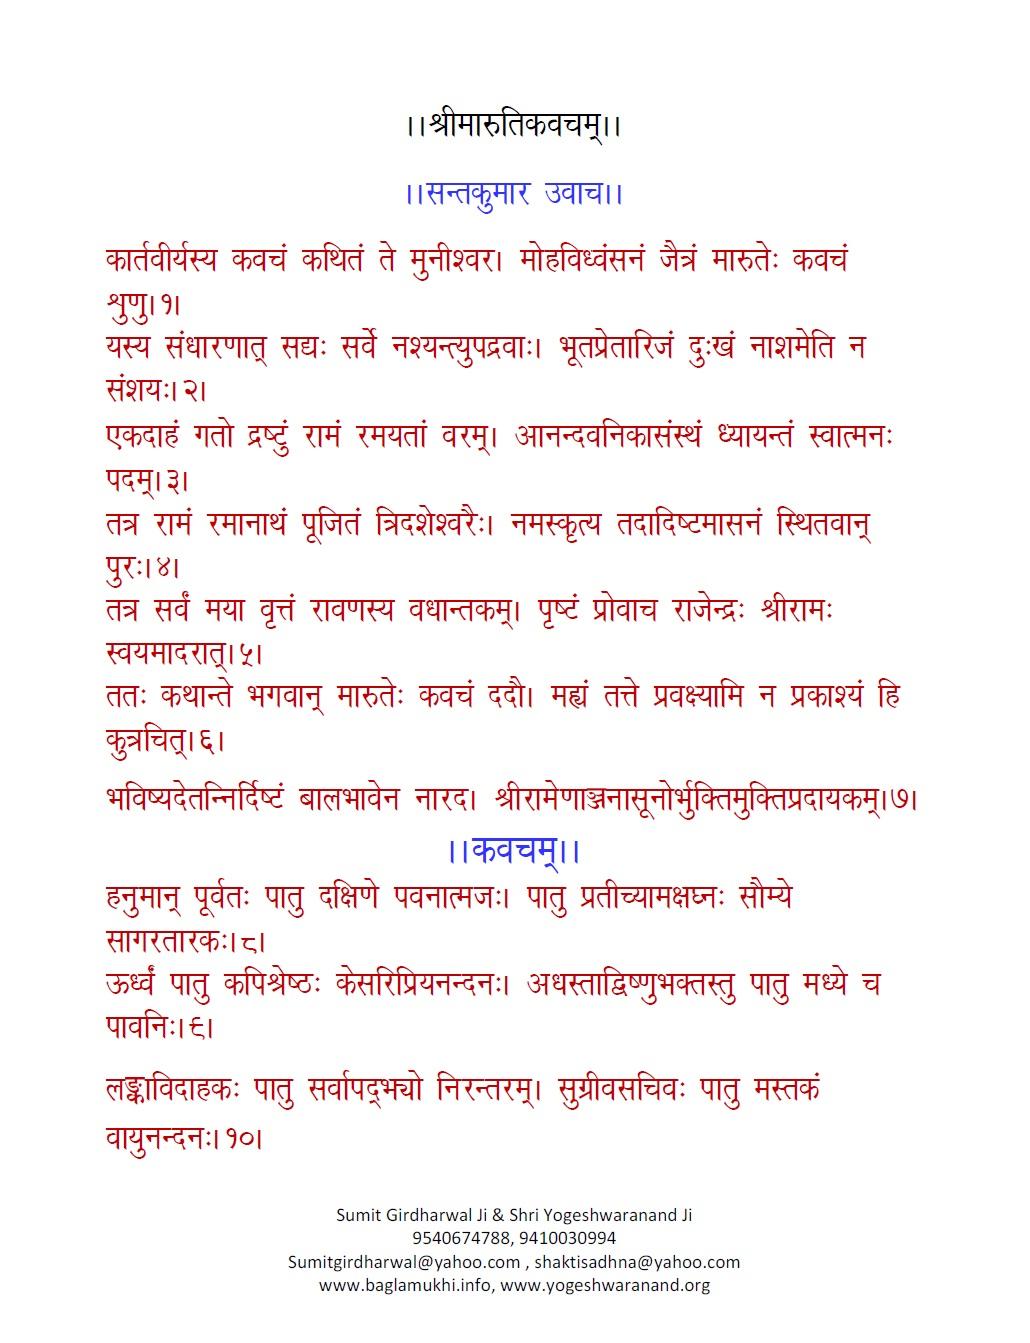 Hanuman beej mantra mp3 free download